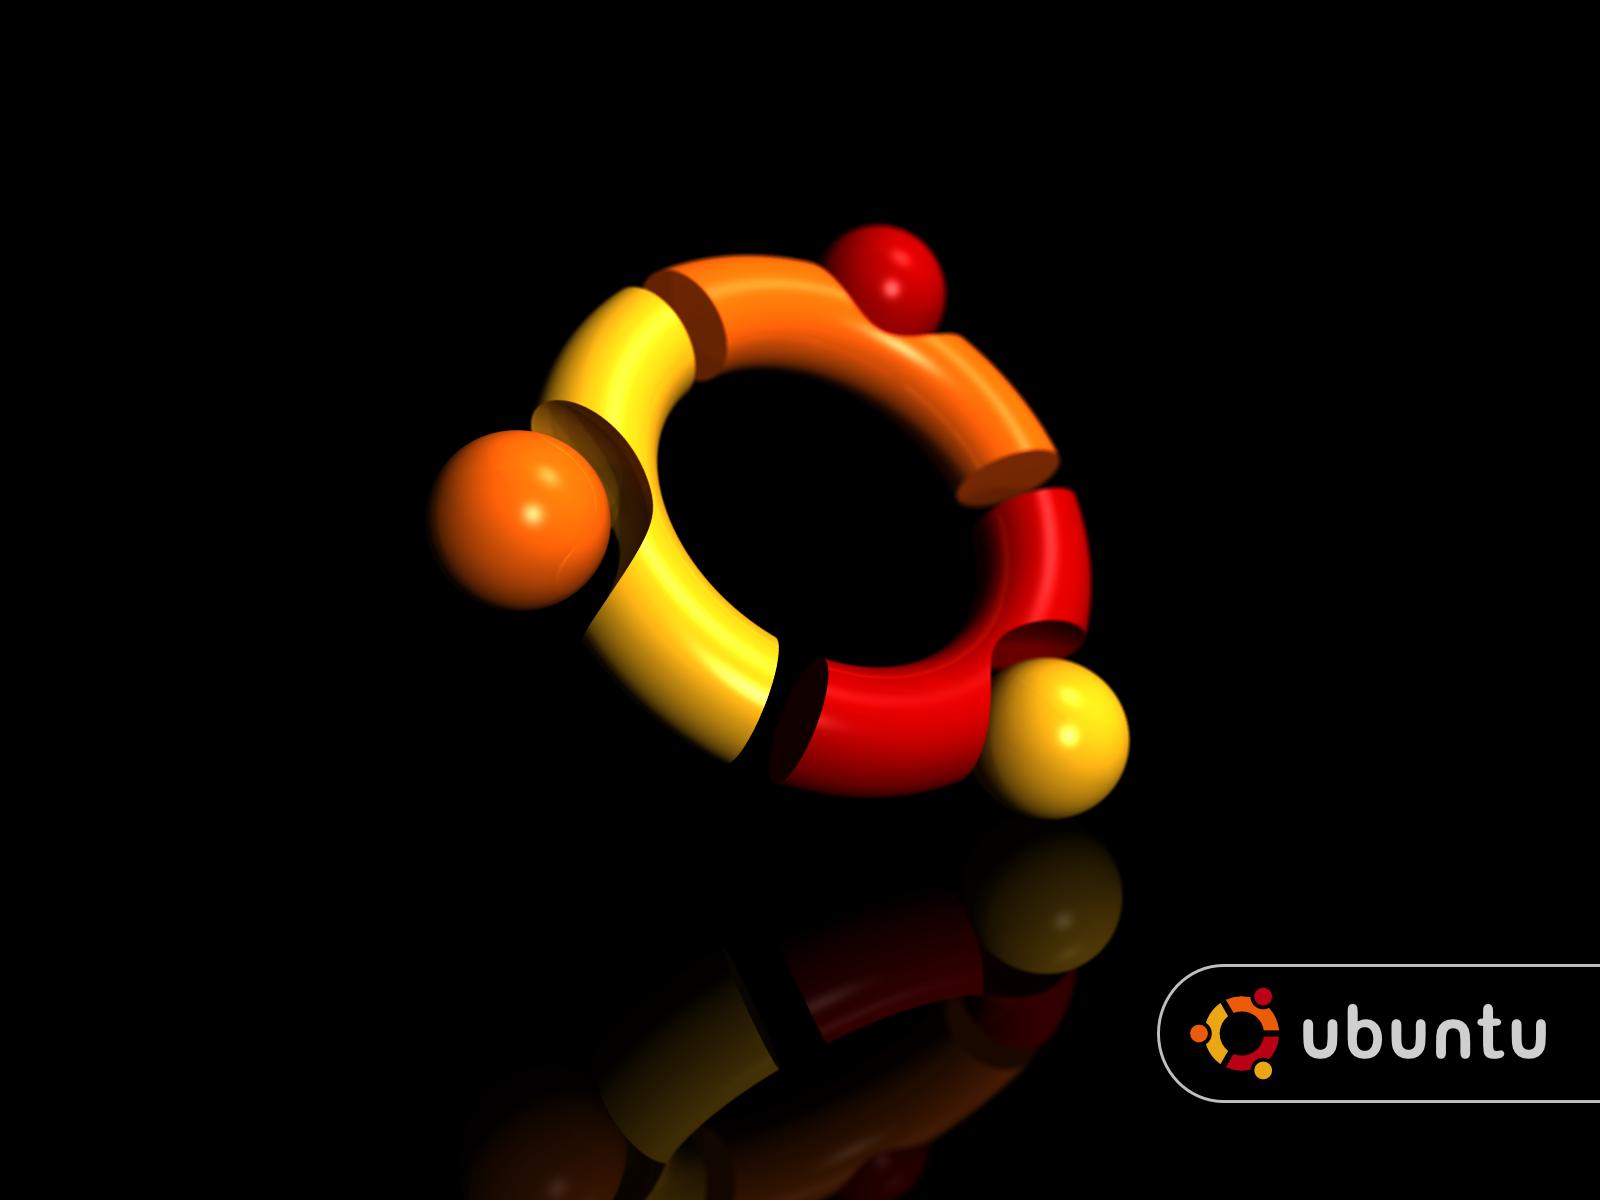 http://1.bp.blogspot.com/_m_UWt5iZ2UE/TLKw1K3lDDI/AAAAAAAAADc/Rm0eWTQQB8k/s1600/ubuntu-logo-with-black-base.jpg.png